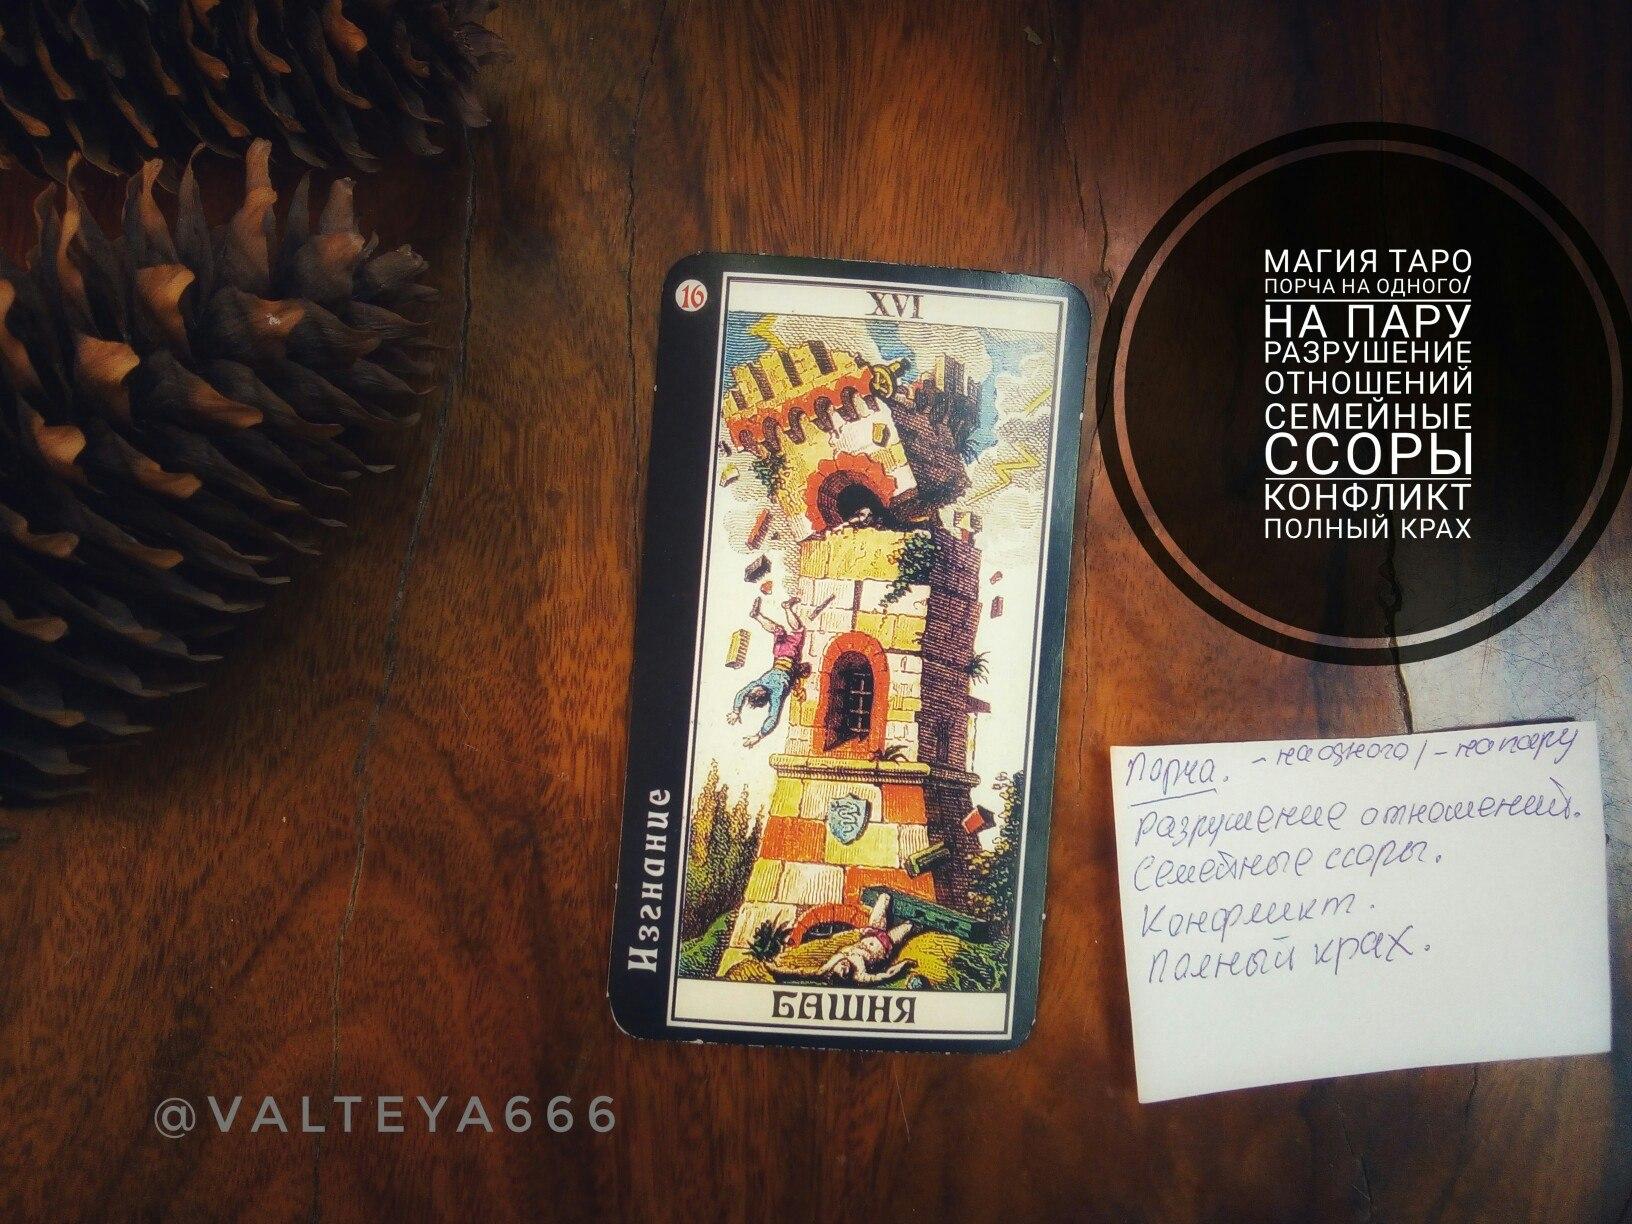 Хештег таро на   Салон Магии и мистики Елены Руденко ( Валтеи ). Киев ,тел: 0506251562  Gs17kdxmnAc